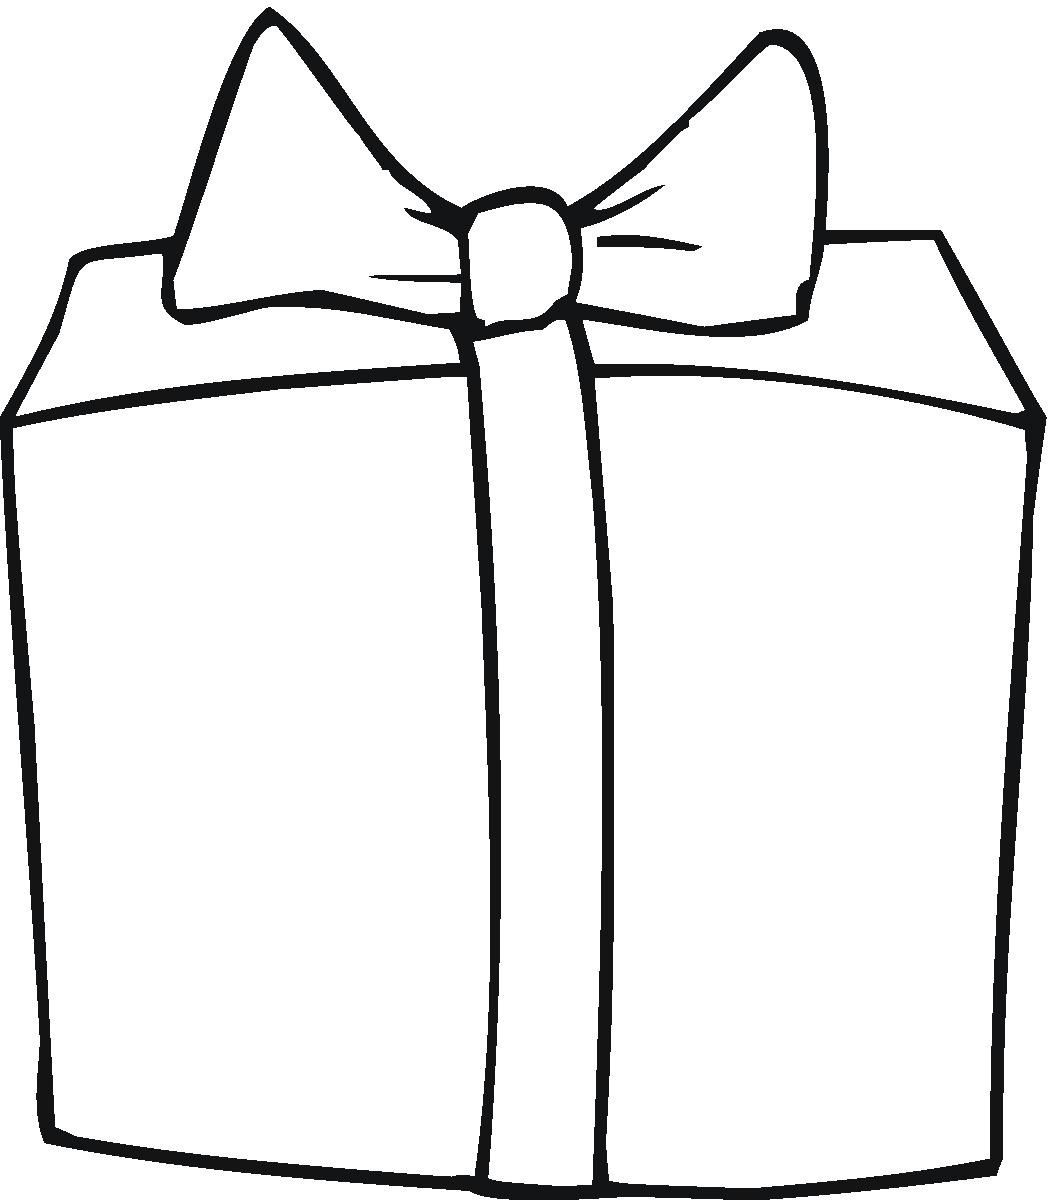 Gift Outline - ClipArt Best